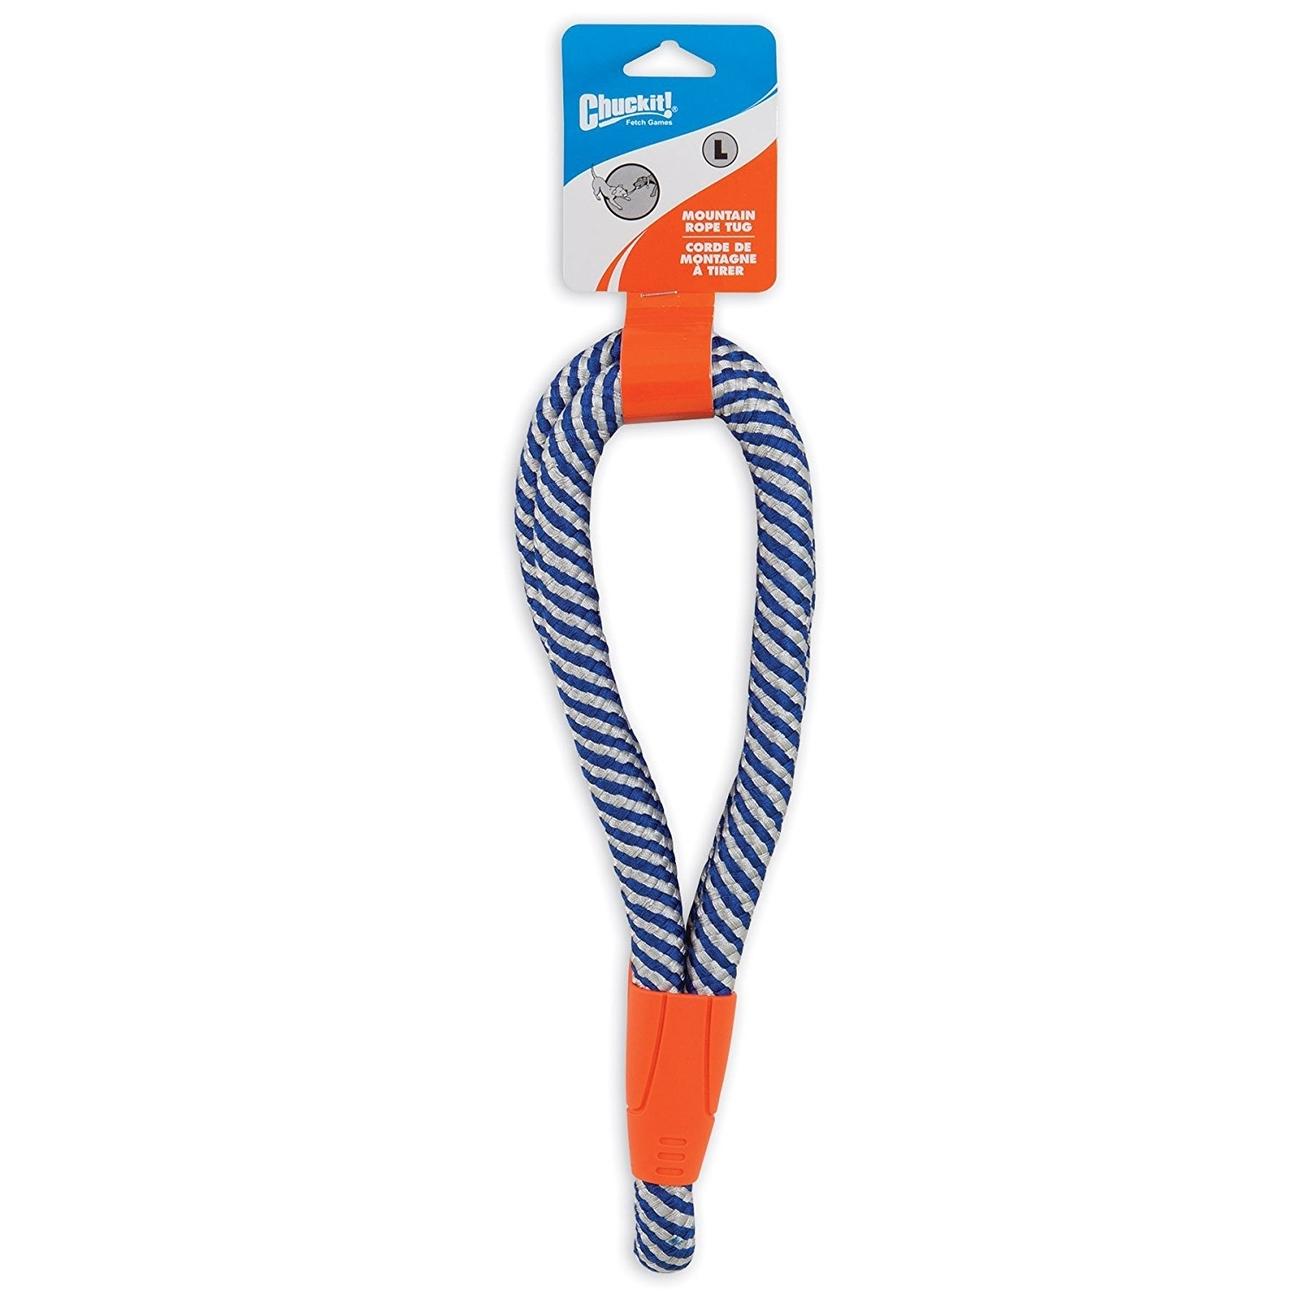 Chuckit! Mountain Rope Tug Zerrspielzeug für Hunde, Bild 4